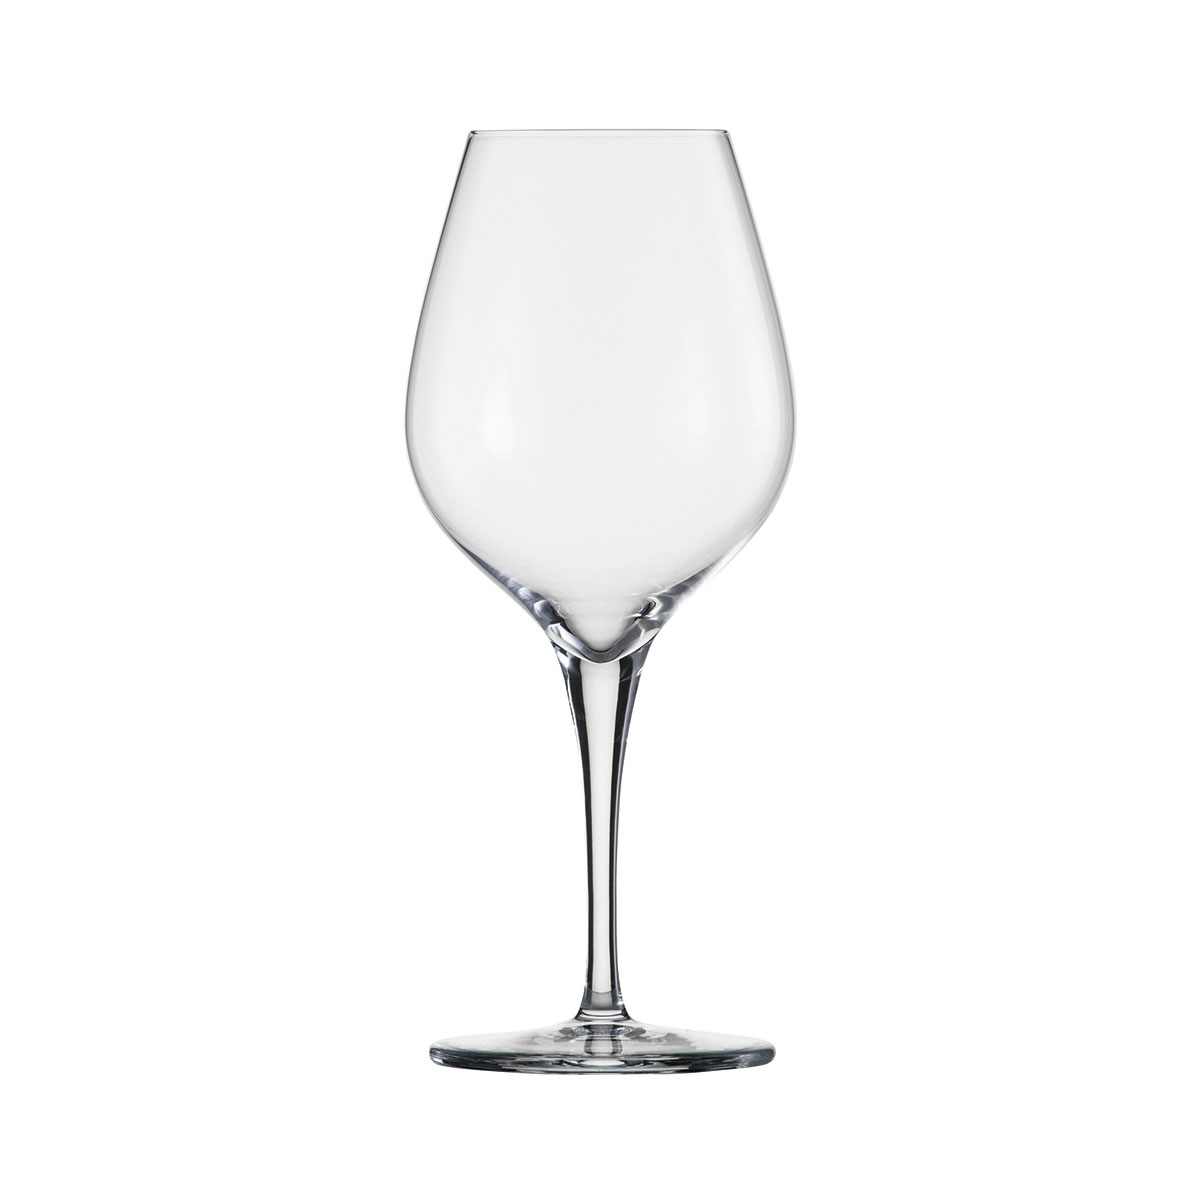 Schott Zwiesel Tritan Fiesta Chardonnay with Effervescent Point, Single